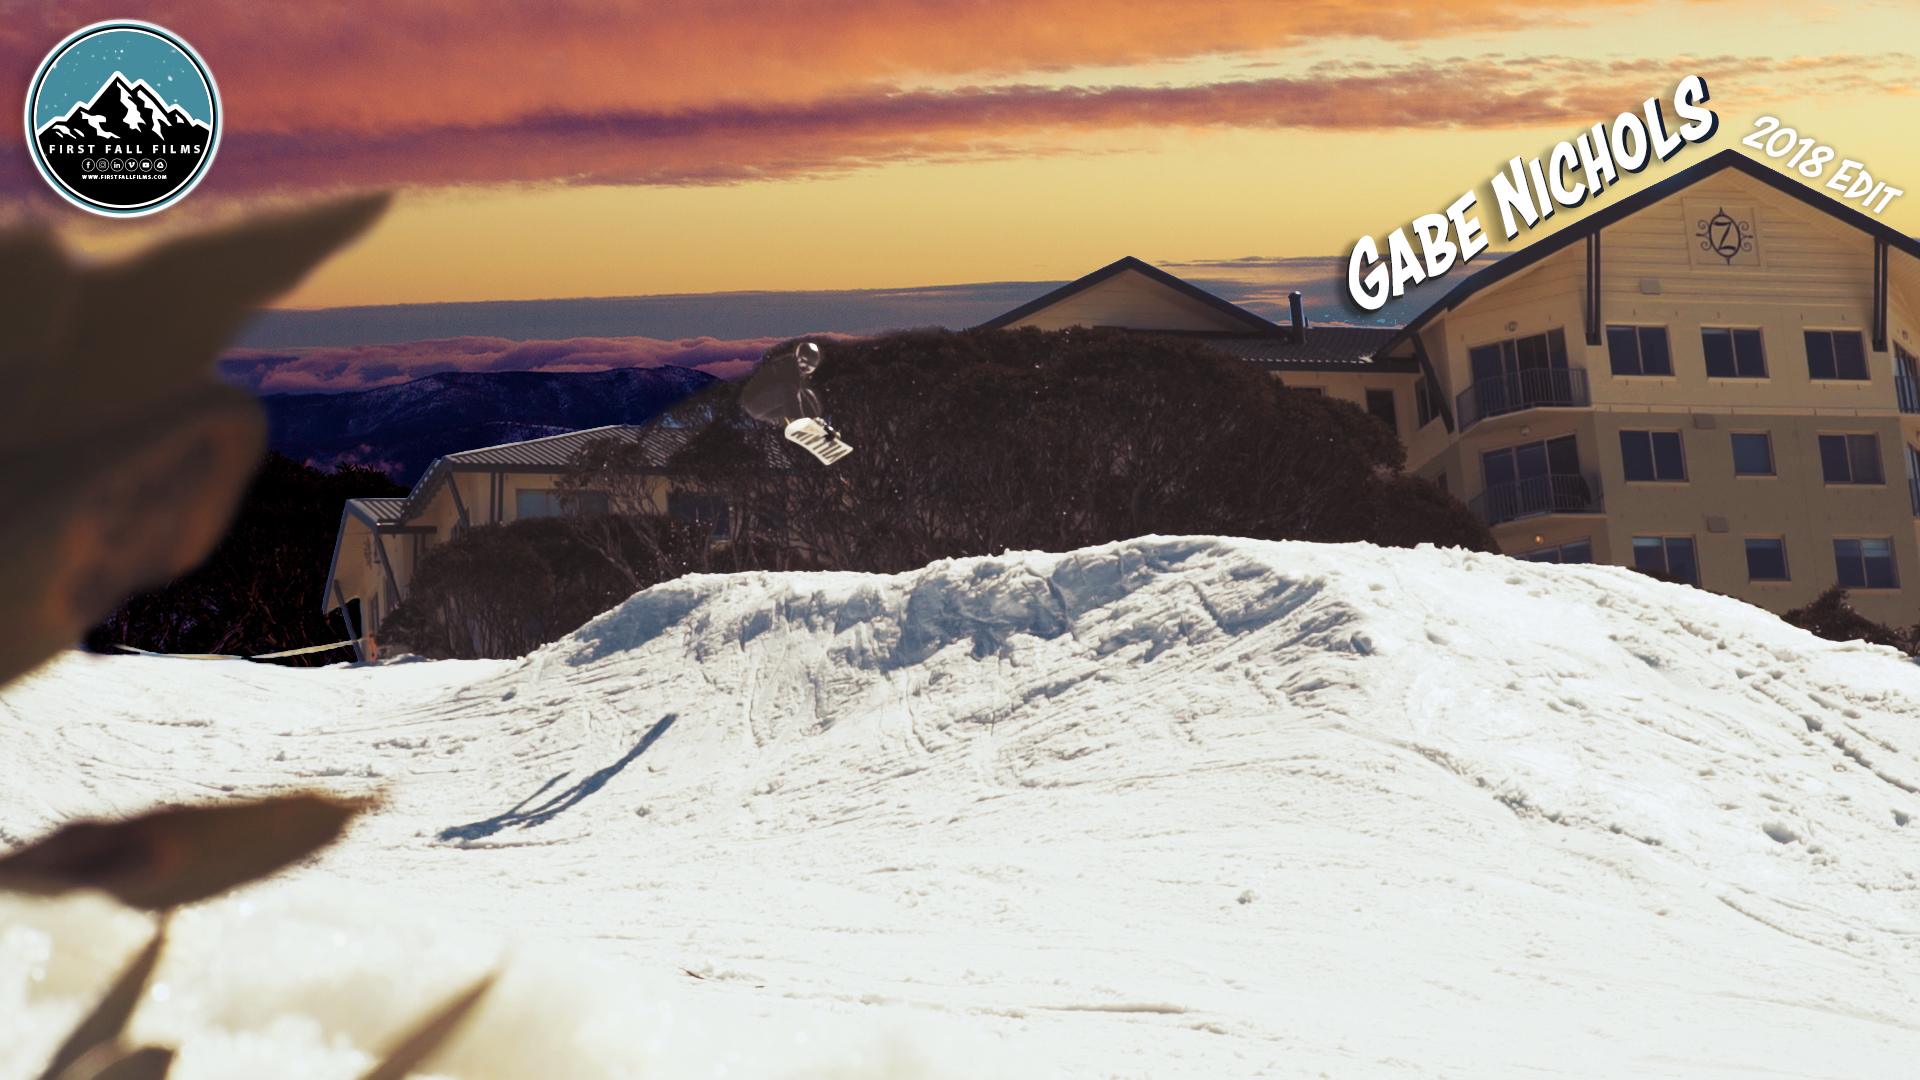 Gabe Nichols 2018 Season Edit